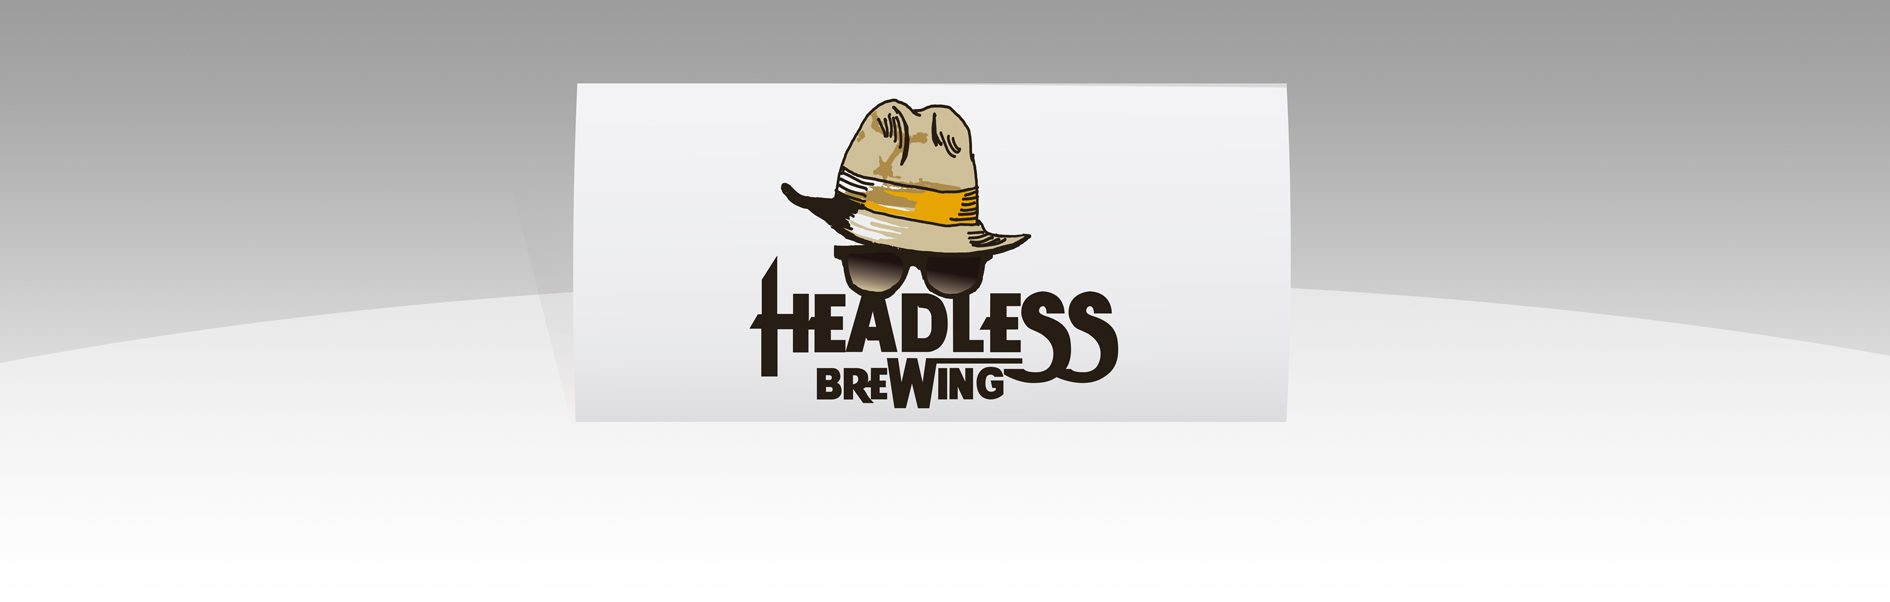 Hier ist das Headless Brewing Logo abgebildet.